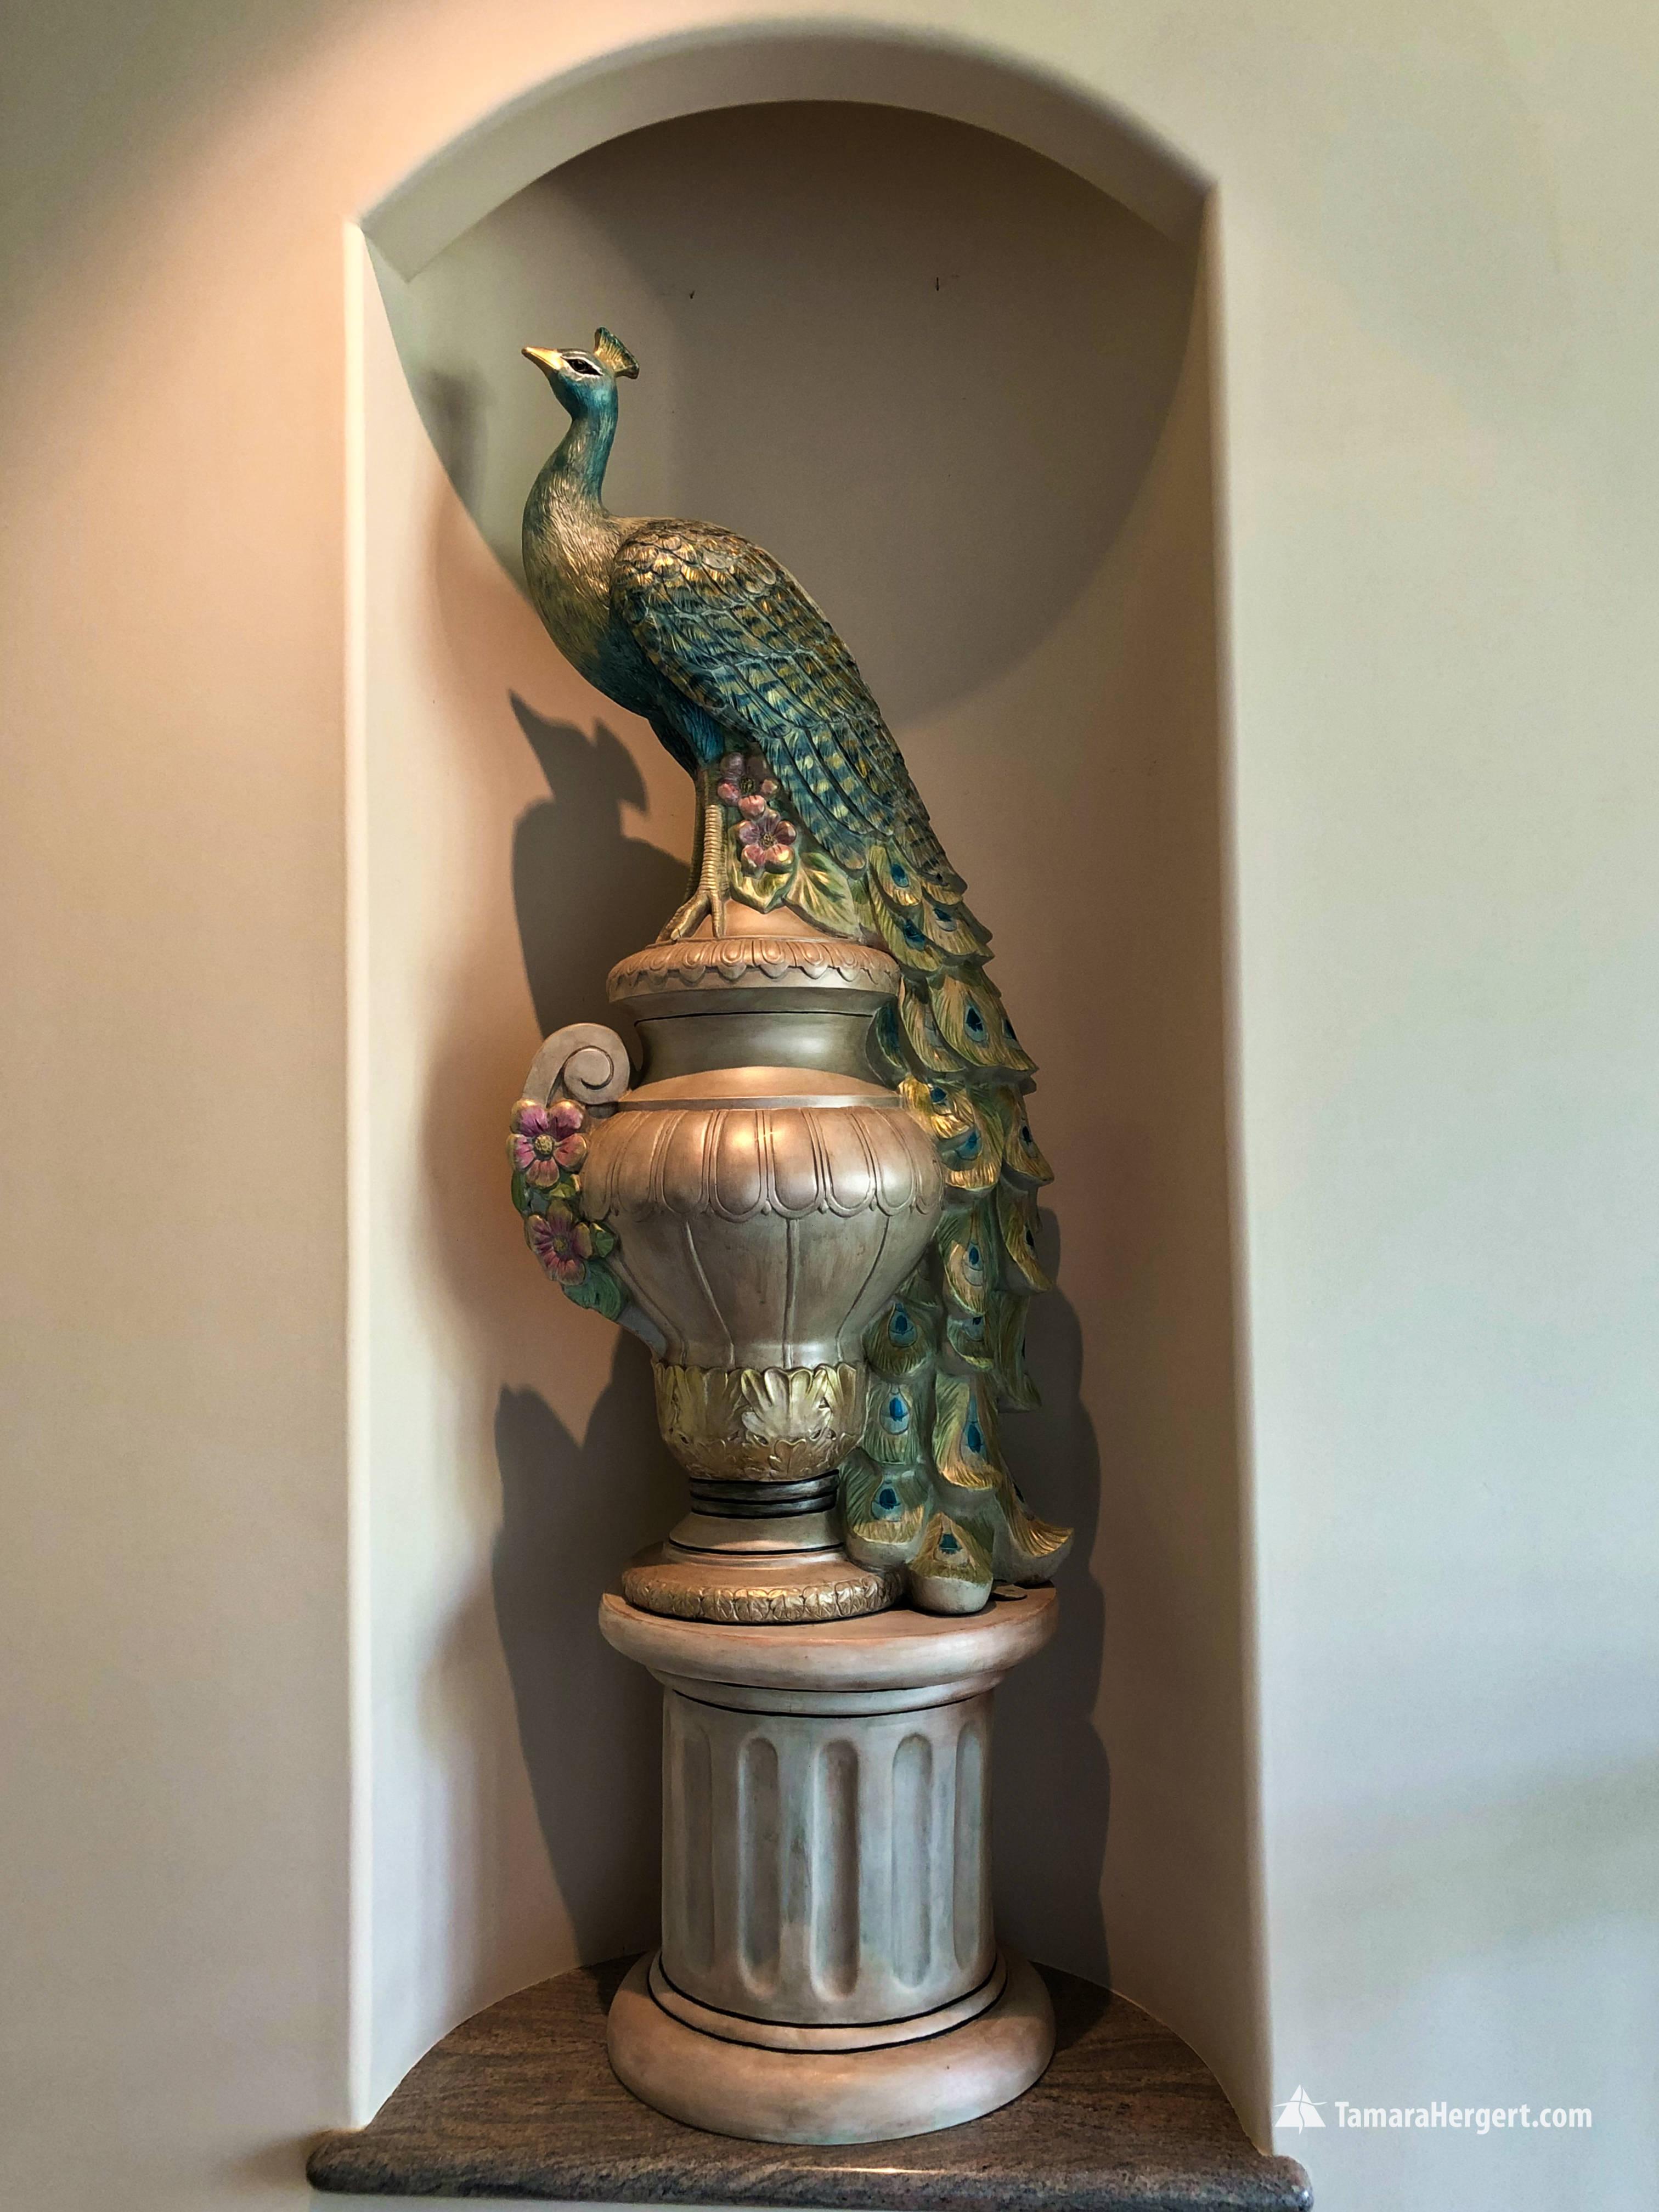 Peacock - Artistic finish by Tamara Herg